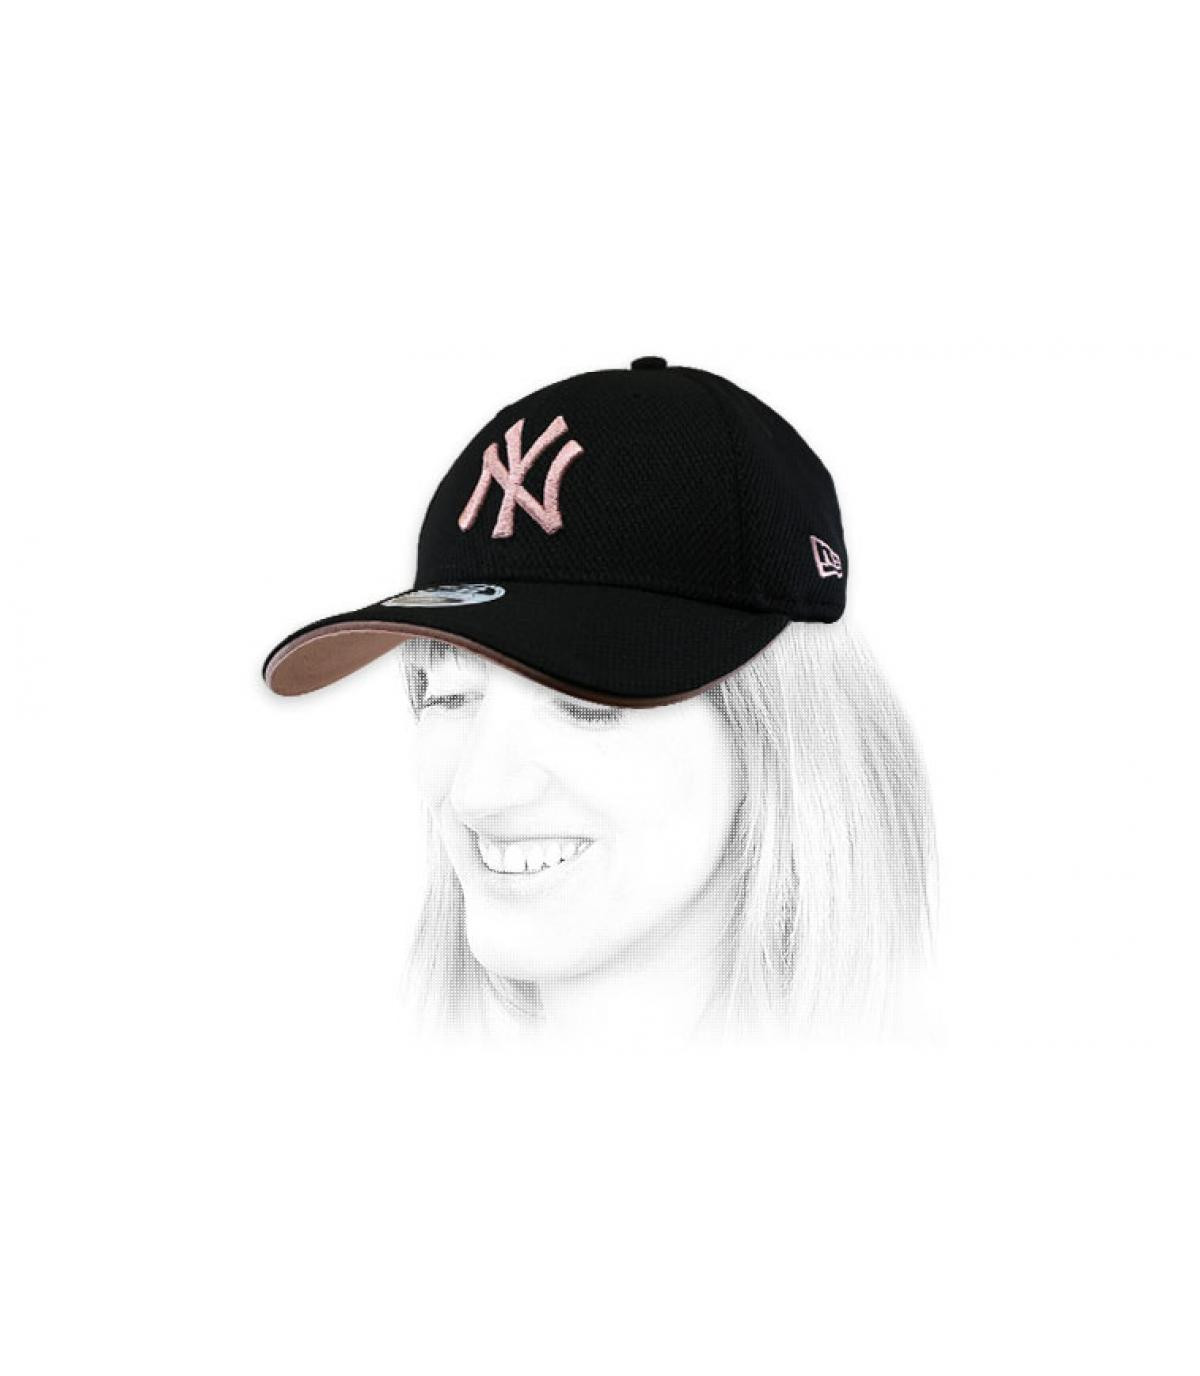 NY zwart roze damesmuts